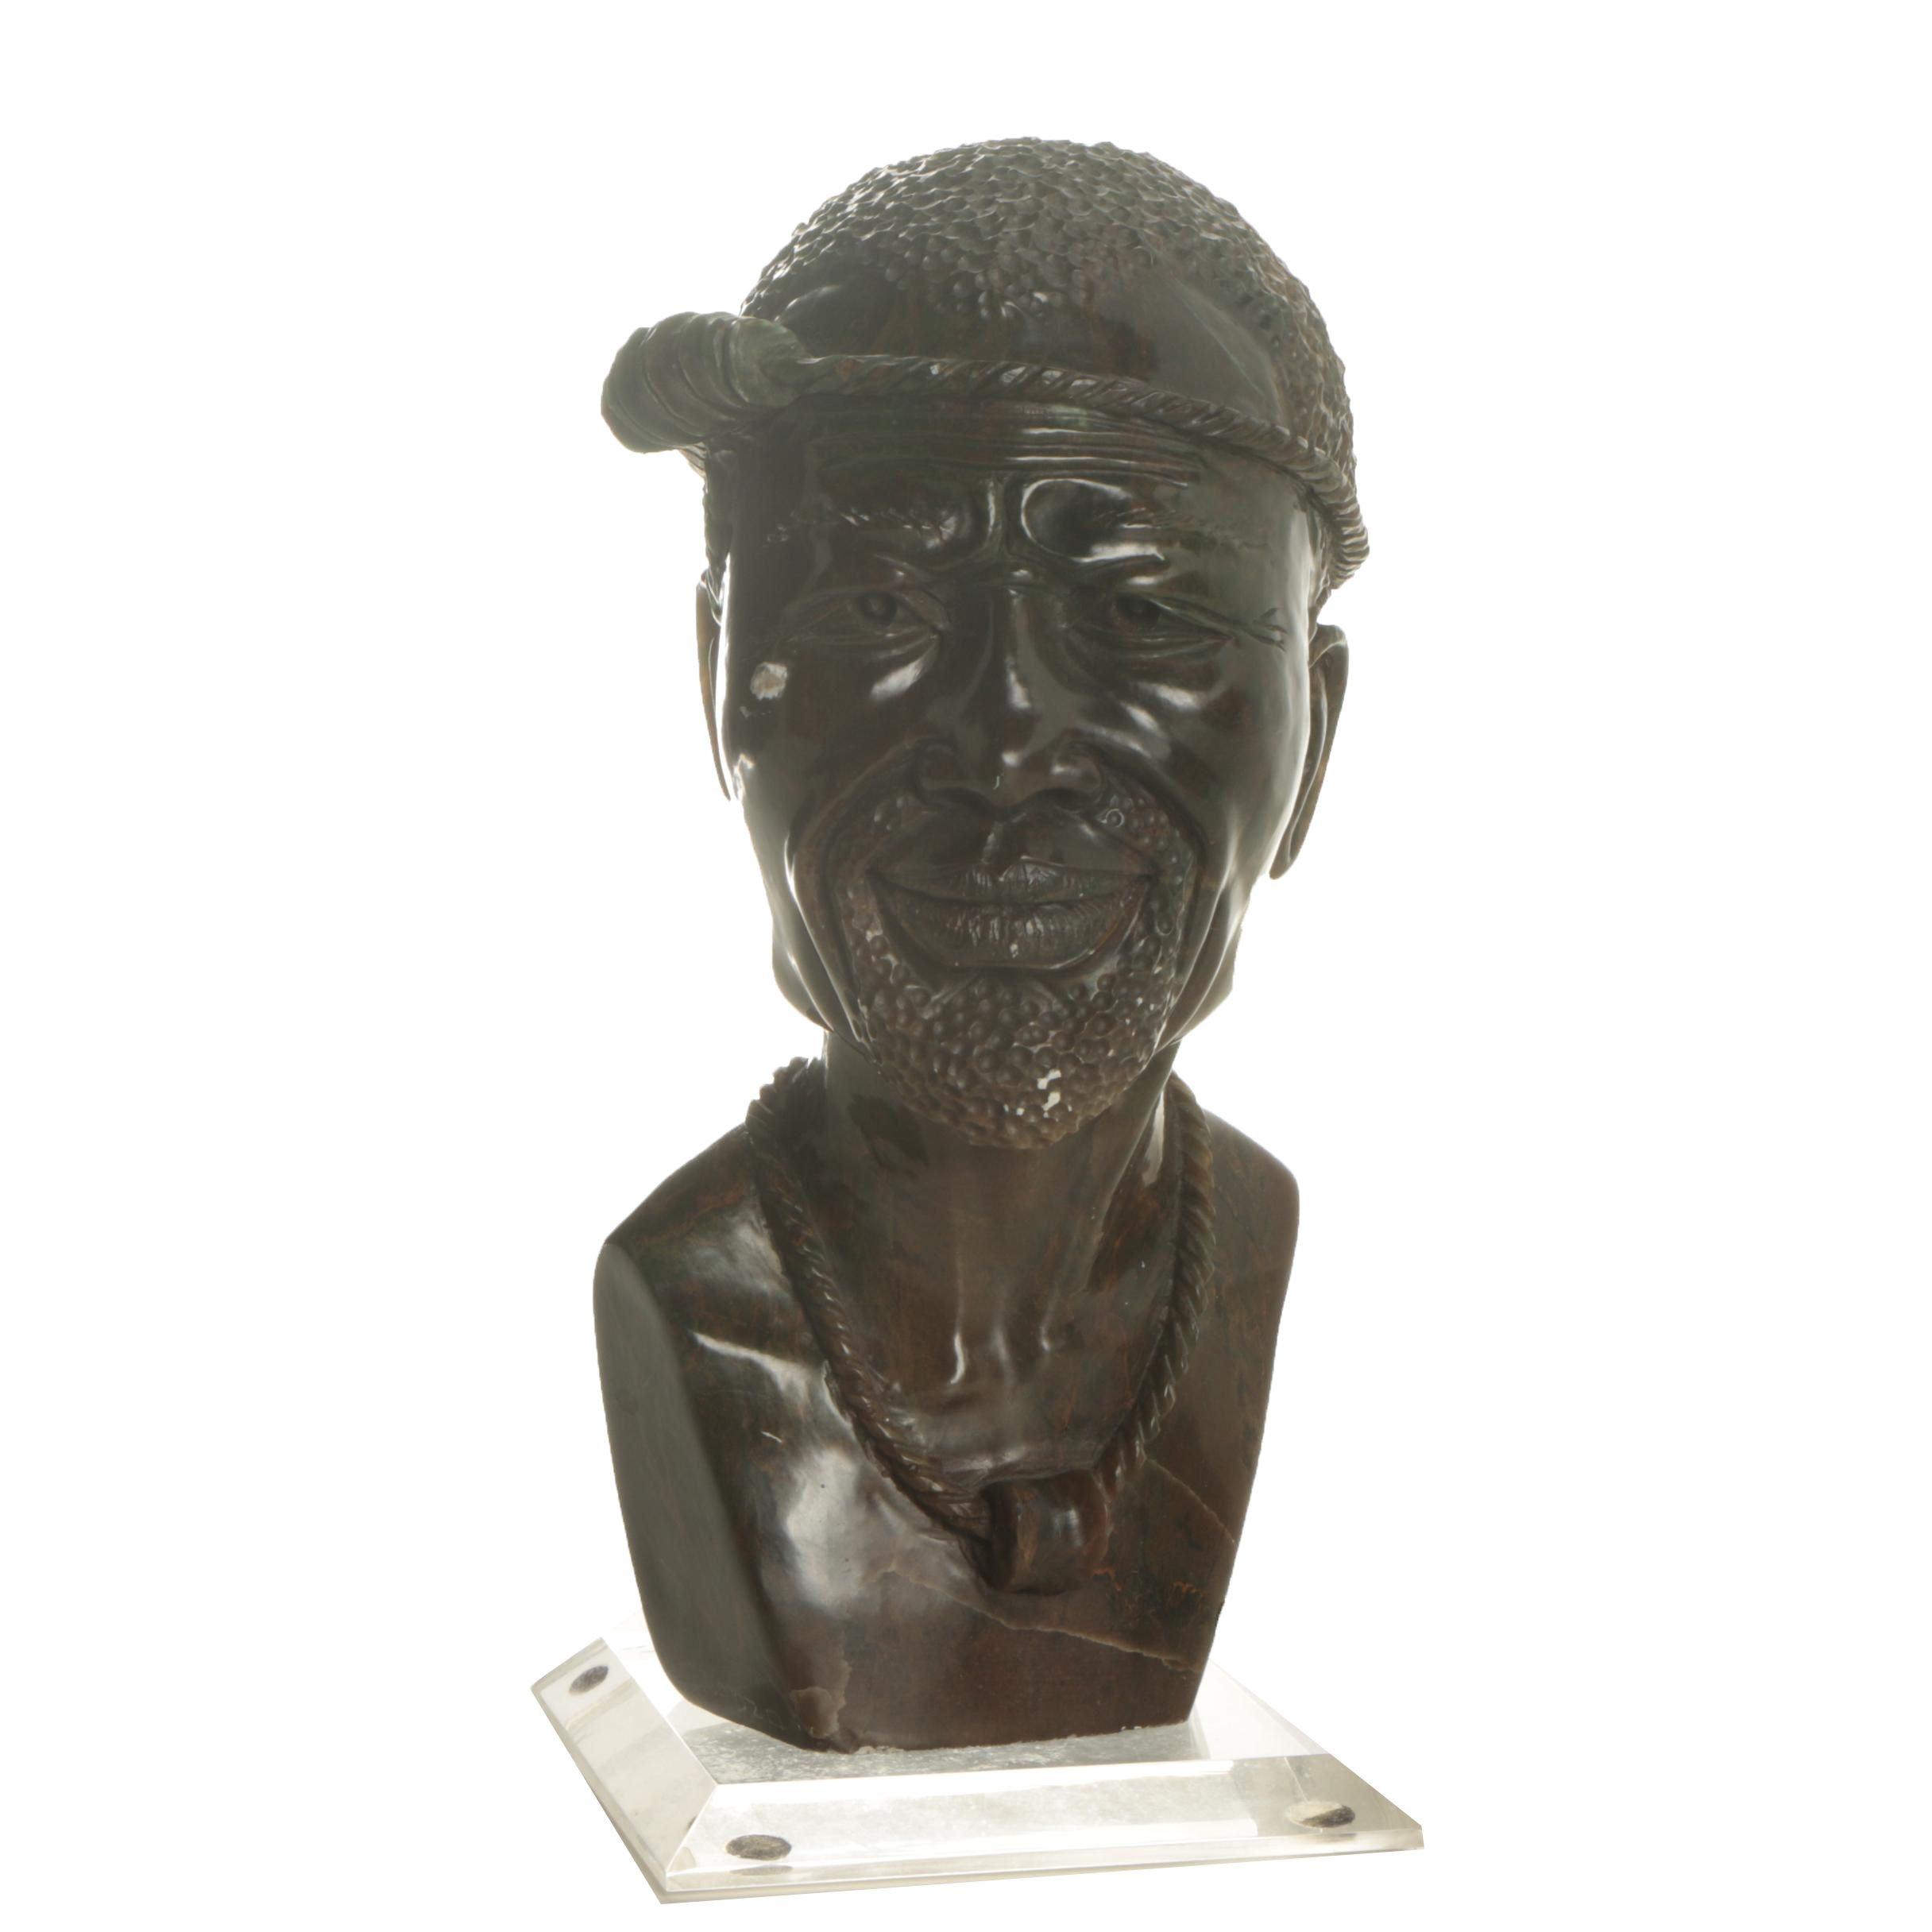 R.J. Dodza Shona Style Serpentine Carving